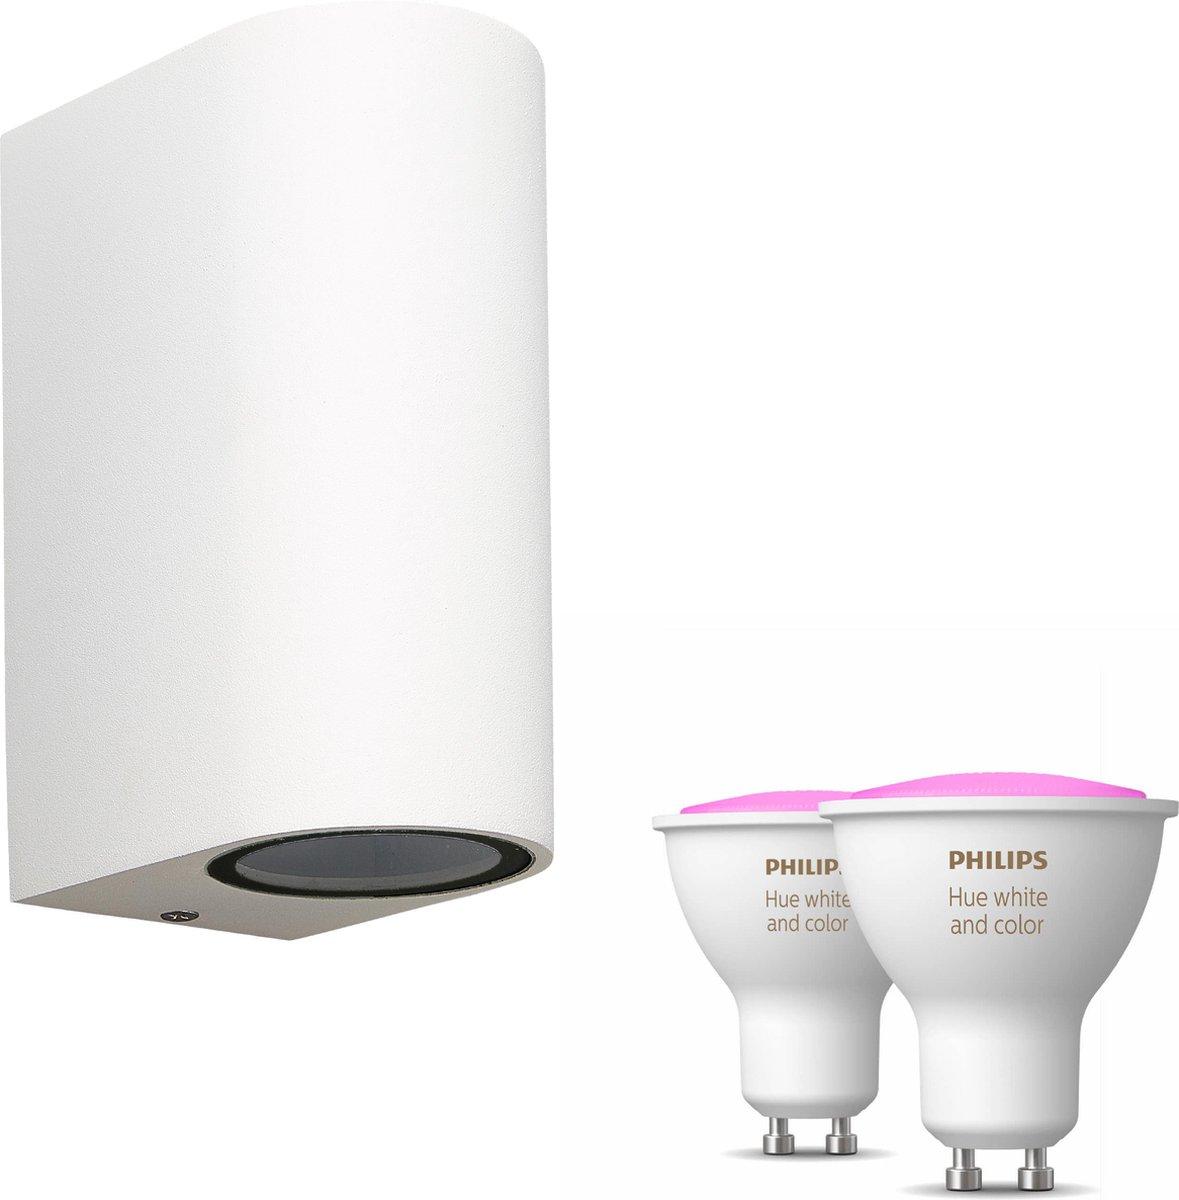 Mantra Kandachu wandlamp rond - wit - 2 lichtpunten - Incl. Philips Hue White & Color Ambiance Gu10 (geschikt voor buitengebruik)